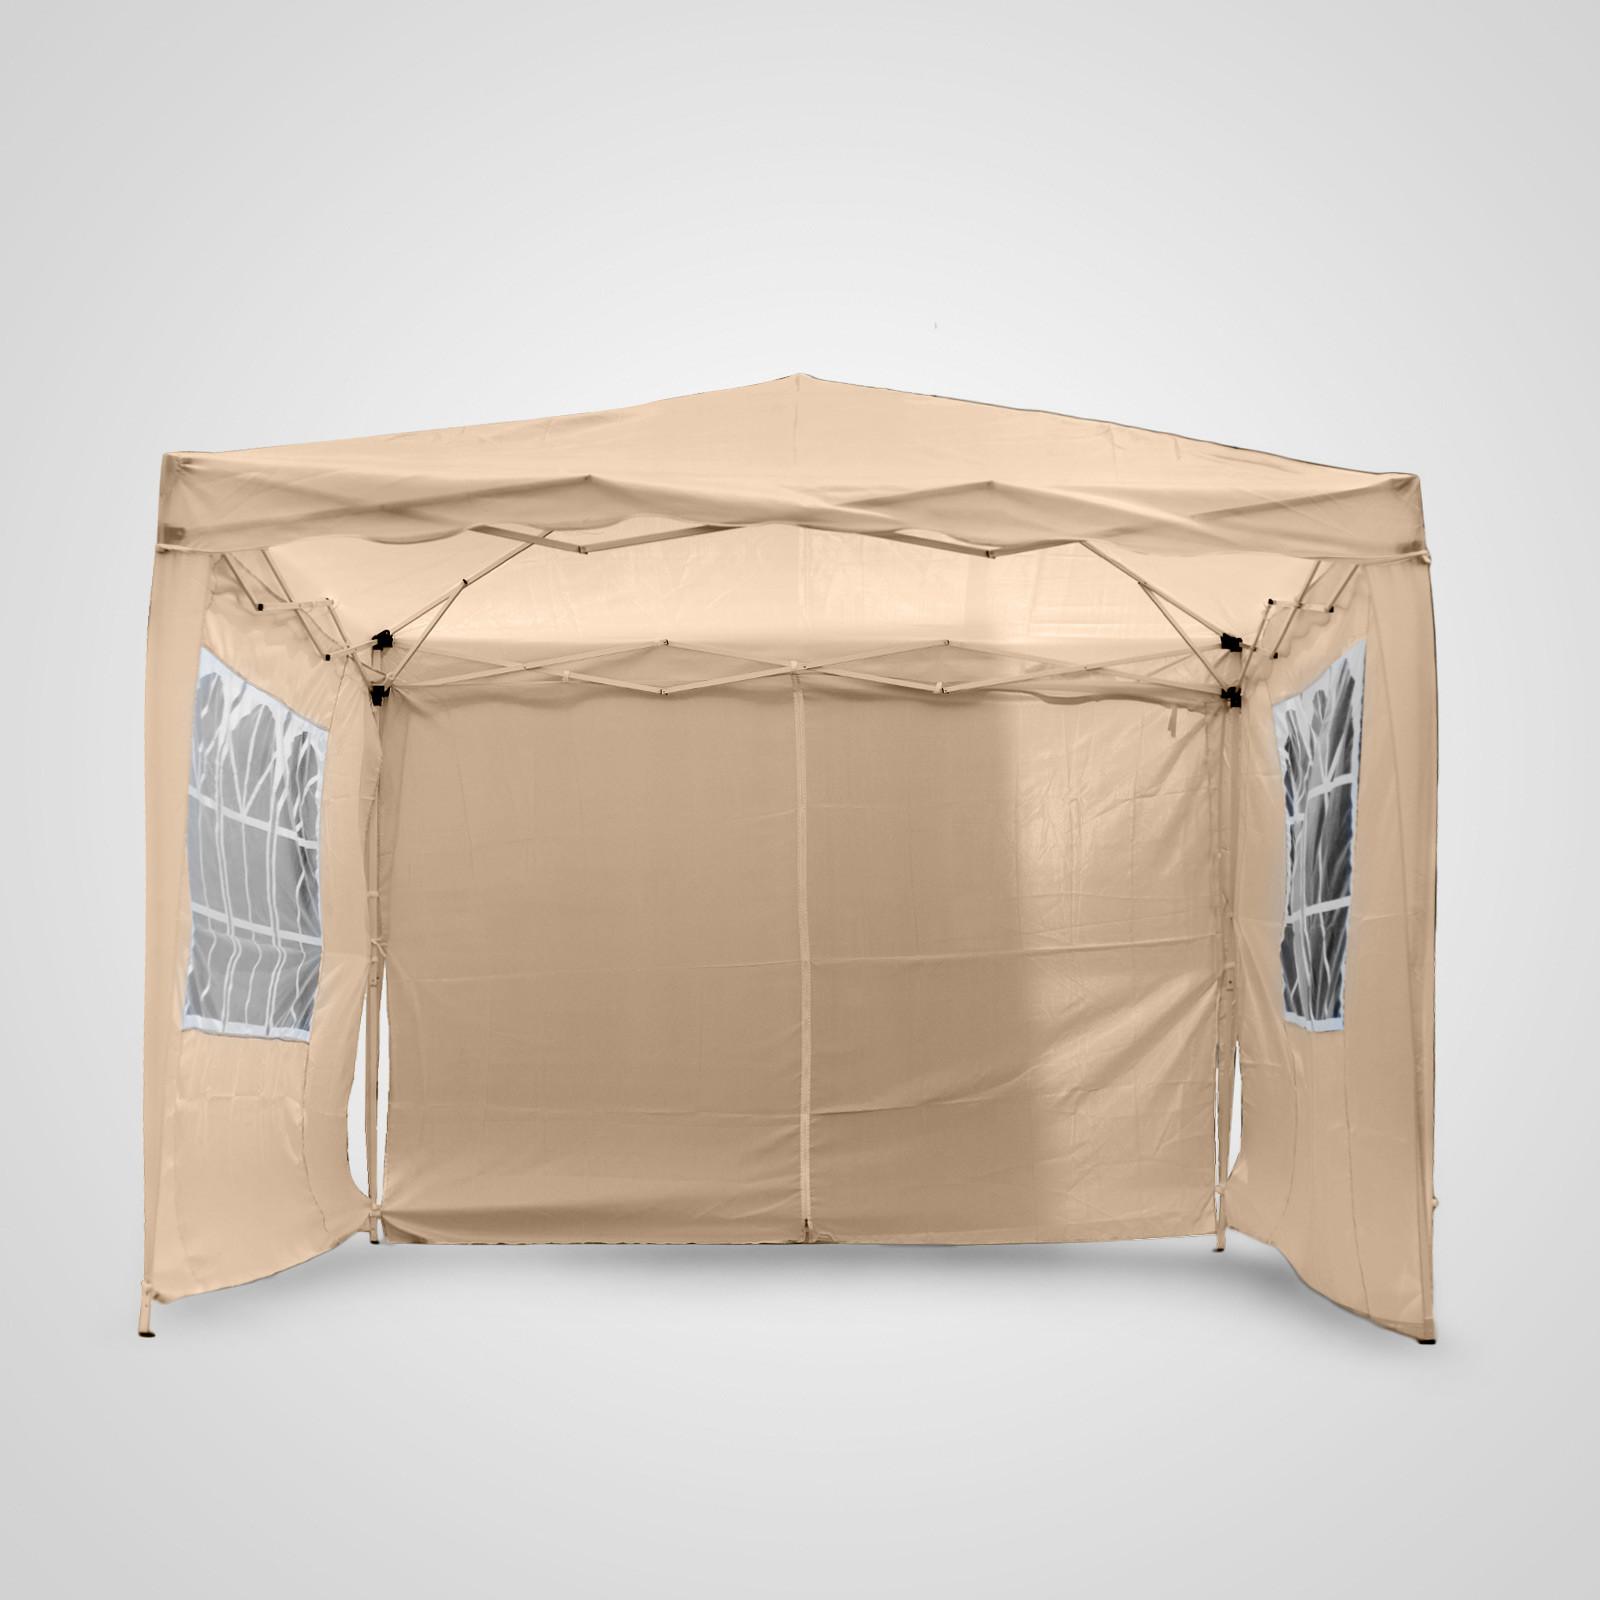 Waterproof Pop Up Shelter : M pop up gazebo tent waterproof canopy awning patio sun